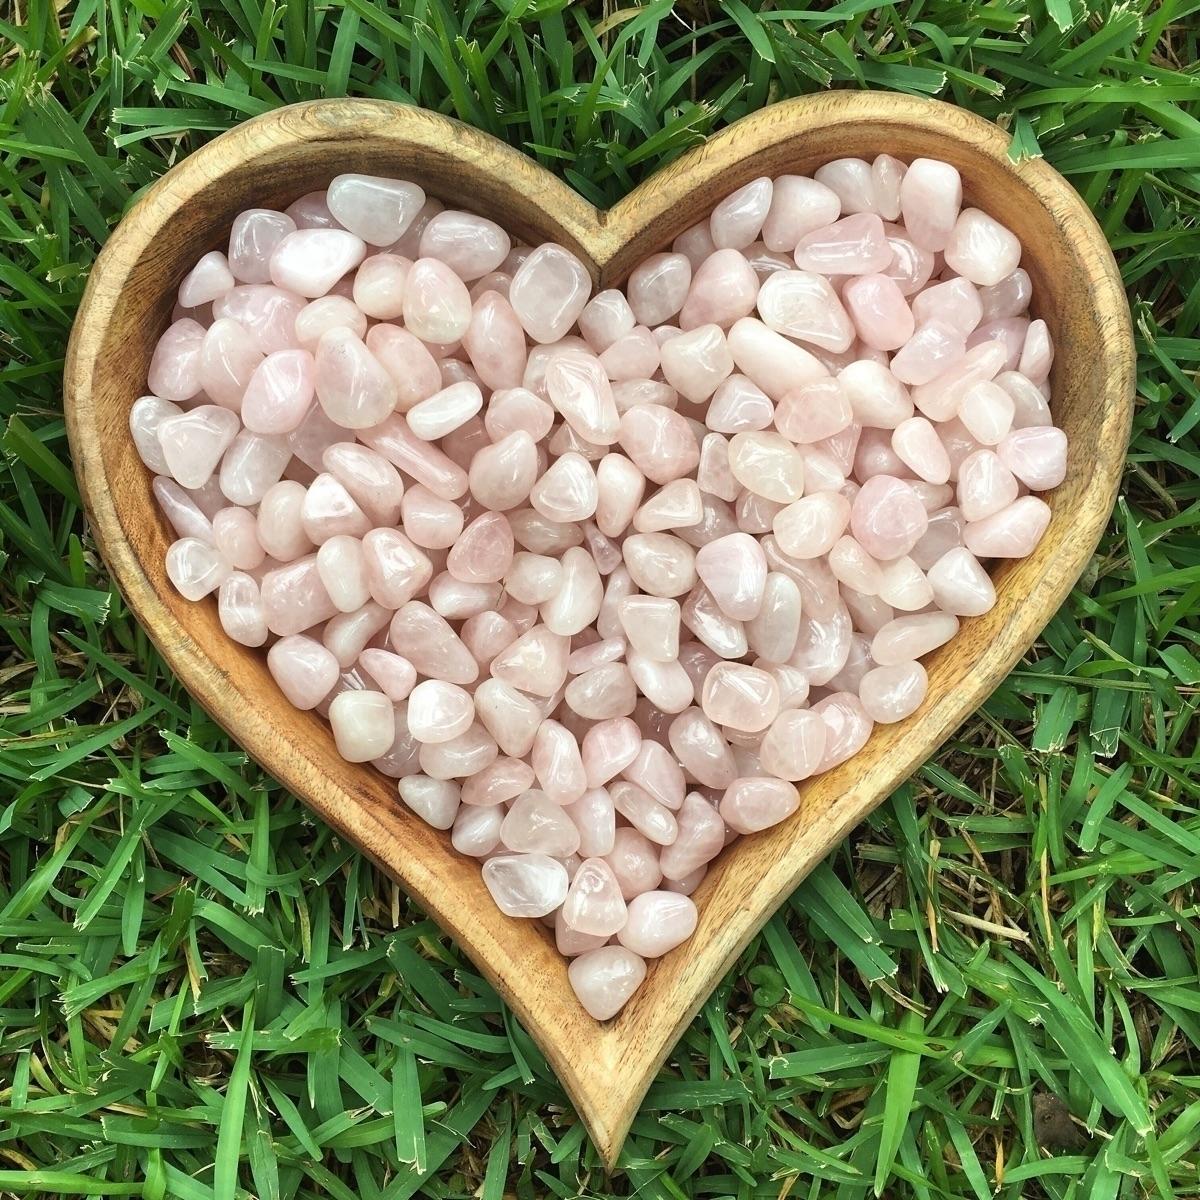 Rose Quartz Love Find Instagram - thesacredcrystal | ello